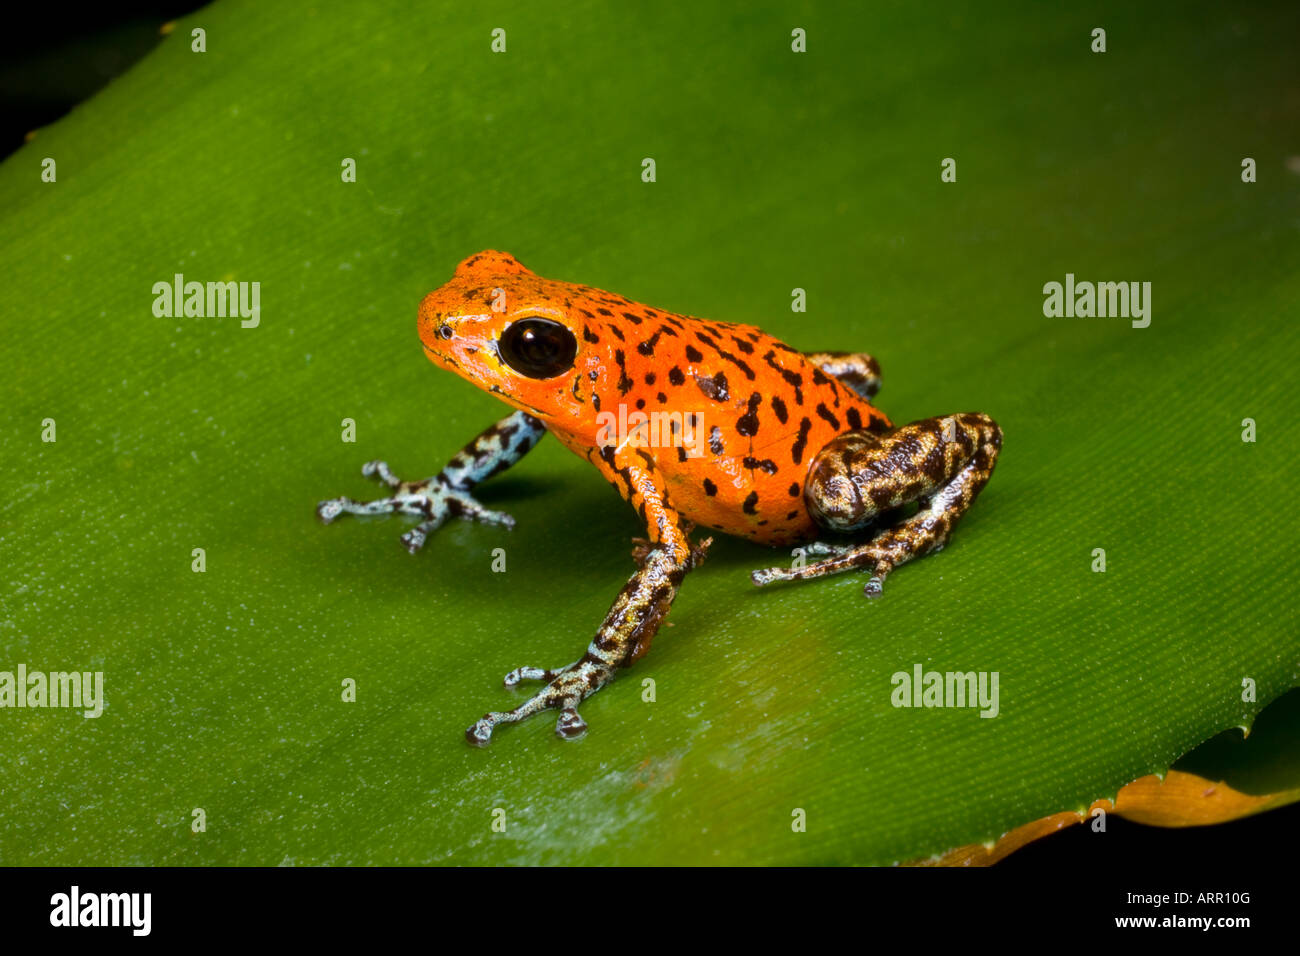 Poison dart frog (Dendrobates pumilio), Panama - Stock Image